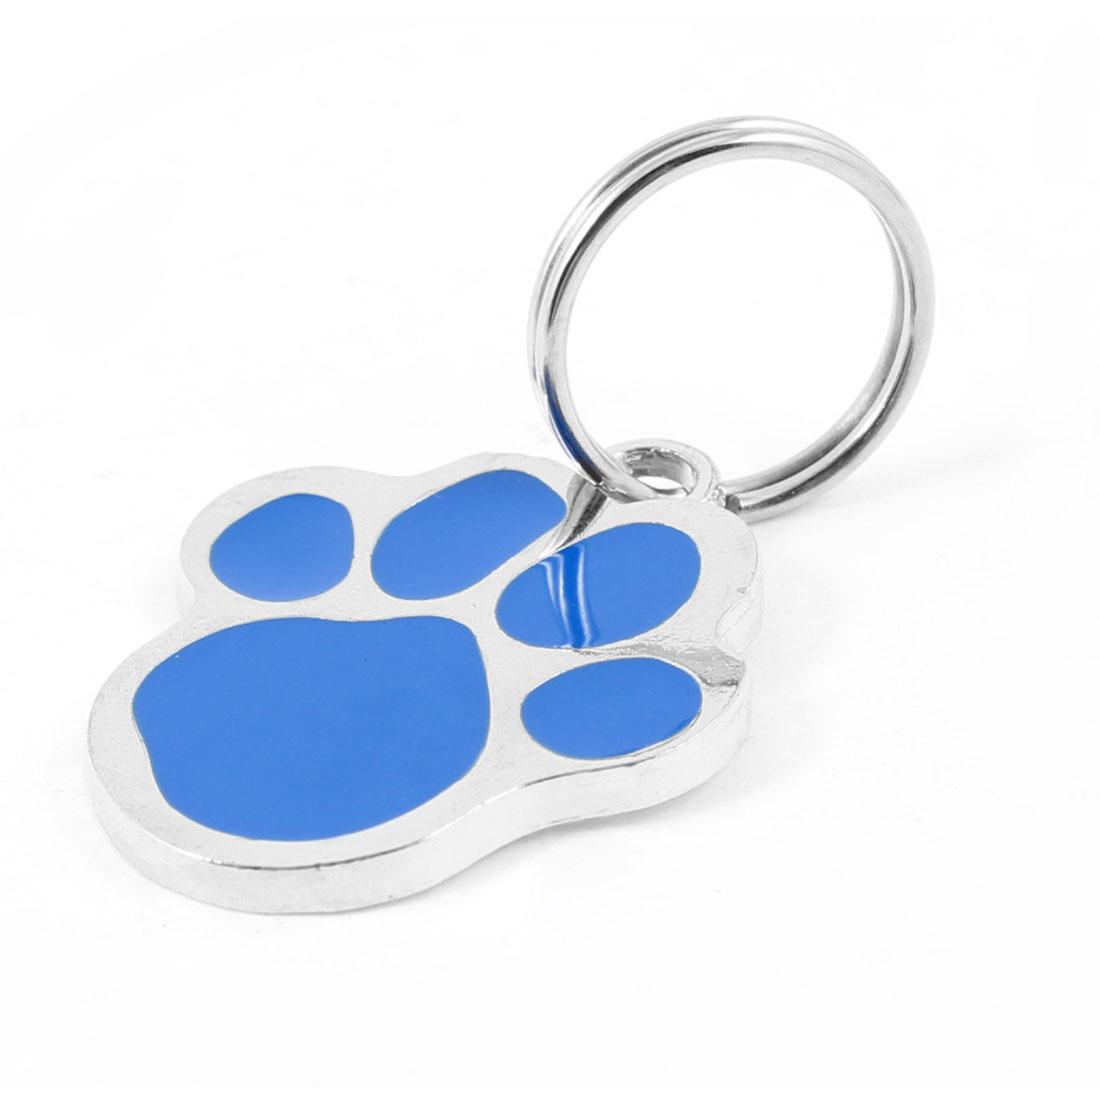 Metal Foot Pet Tag Cat Dog Personalised Collar Badge Keyring Pendant Blue Silver Tone